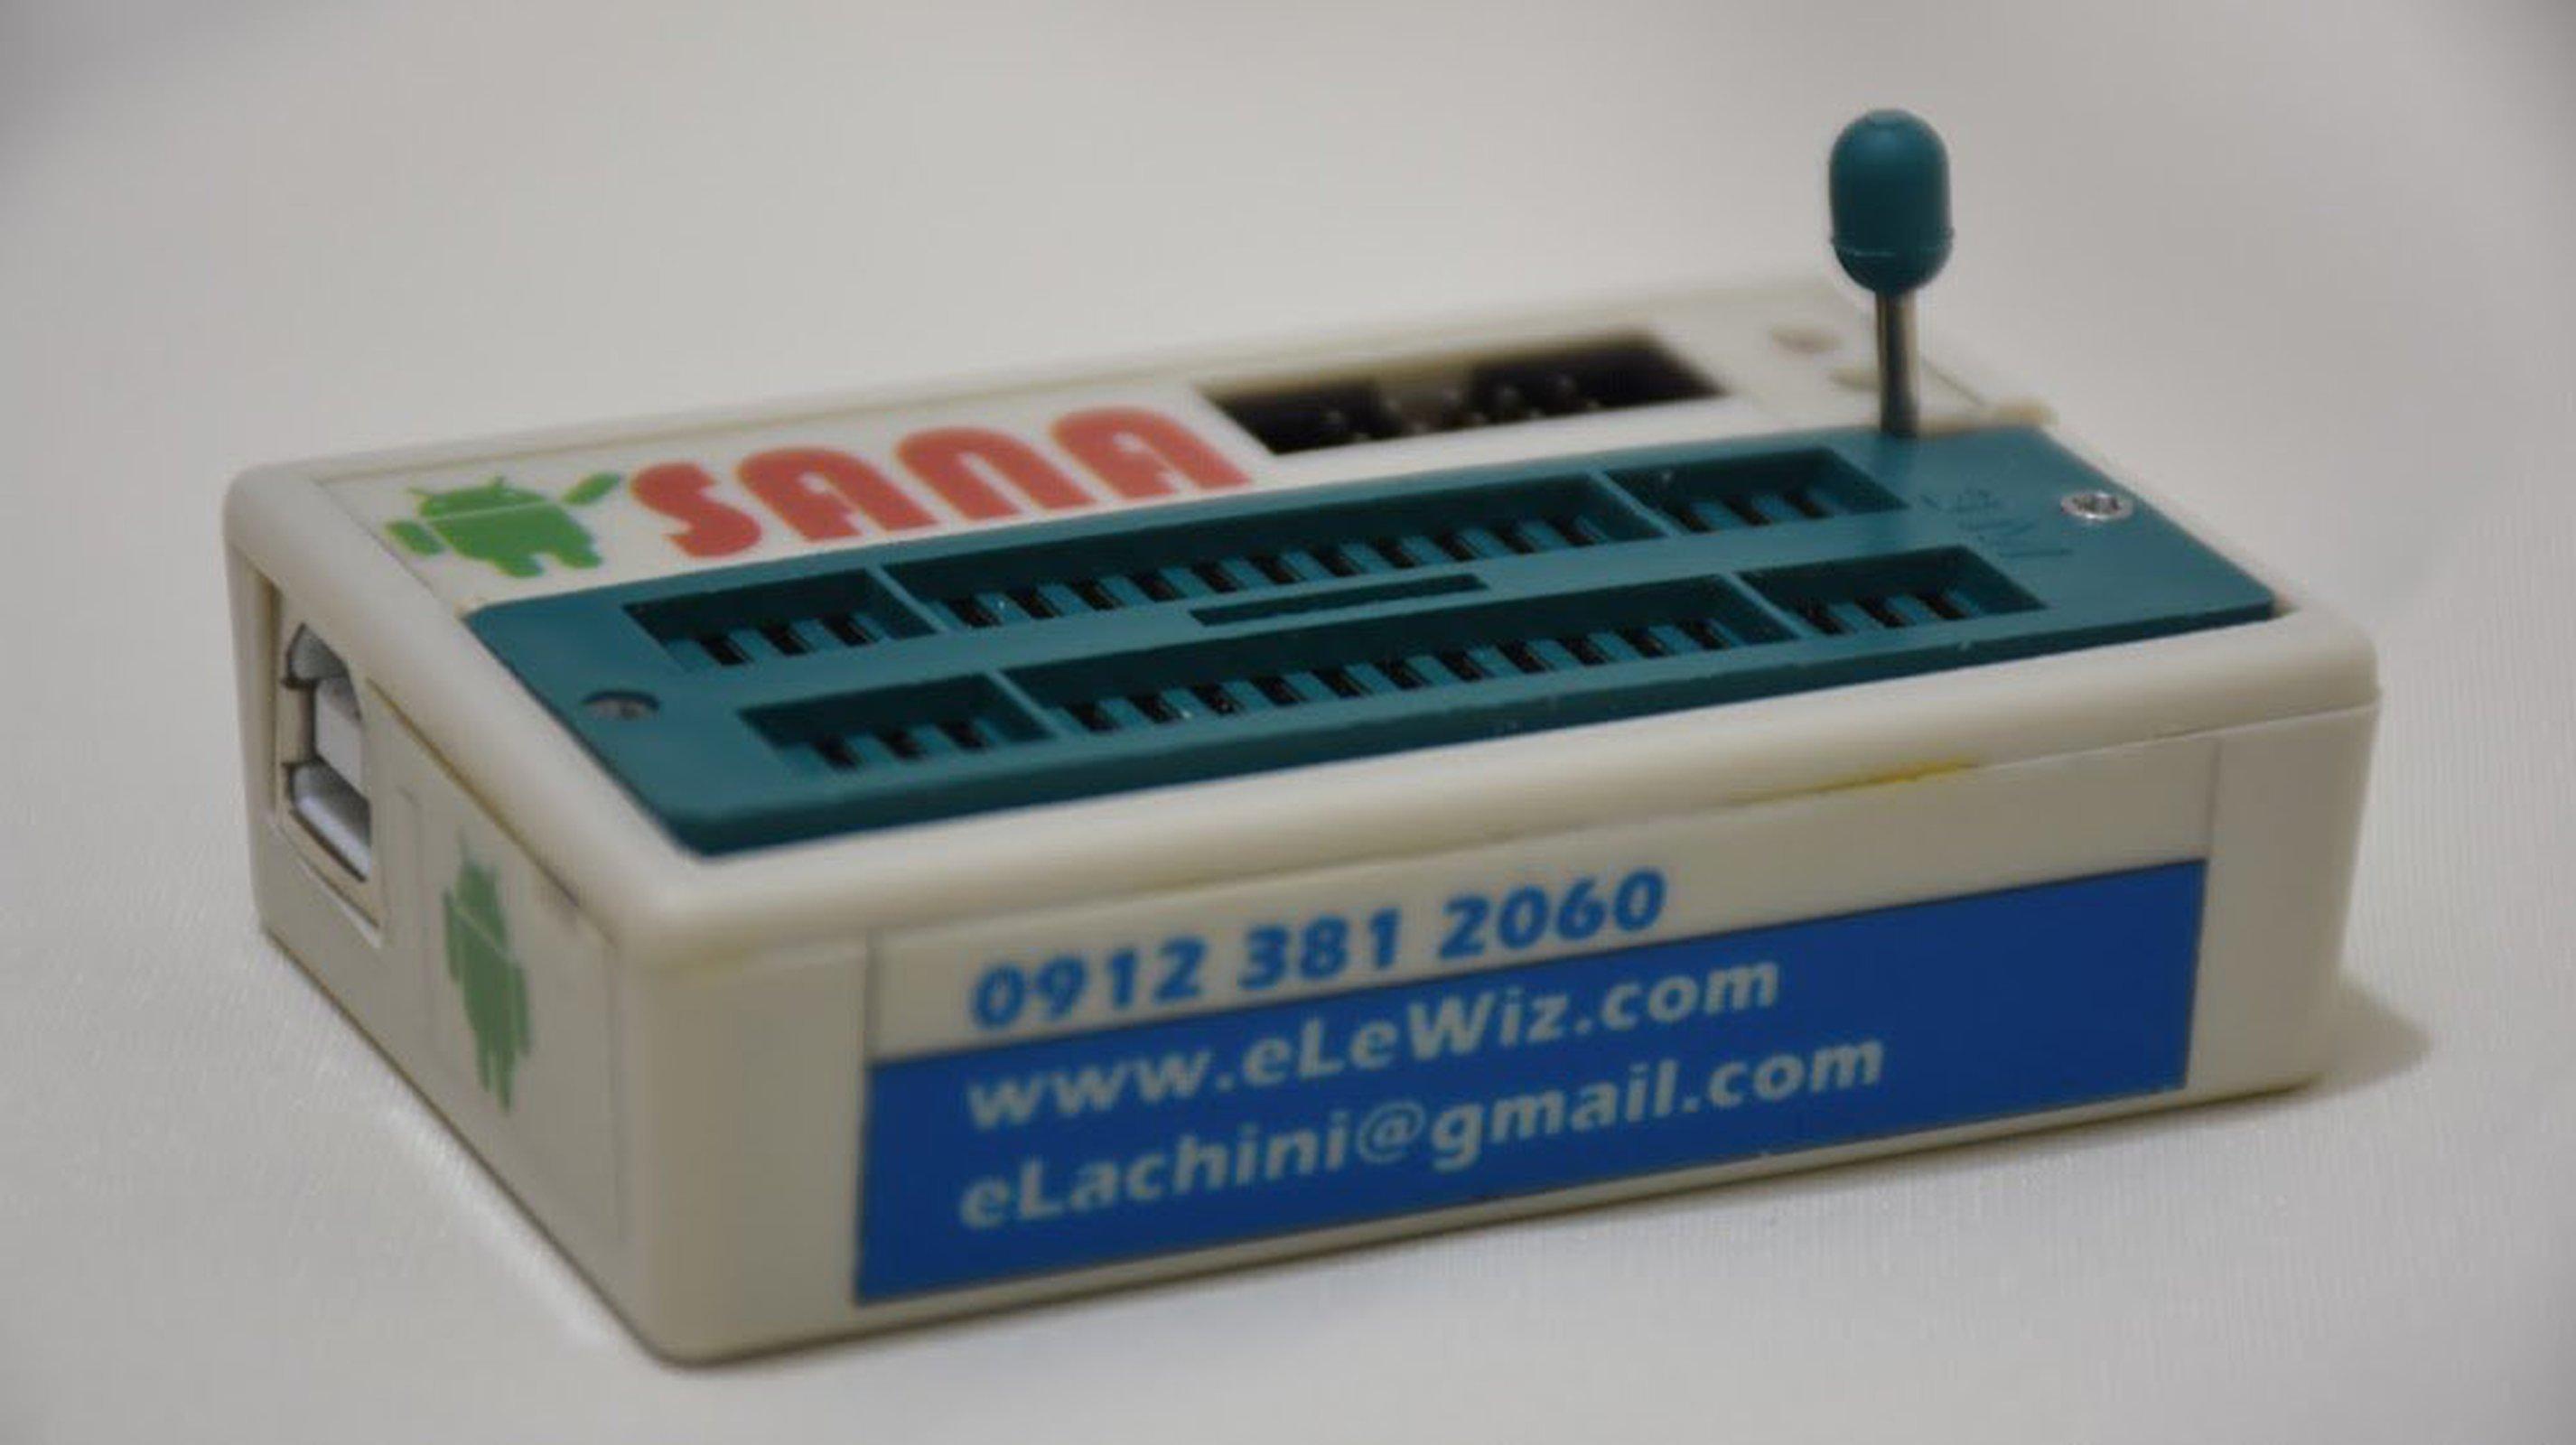 Sana Ic Tester Usbasp Programmeravr 2493cxx From Hossein Lachini Atmel Usb Programmer Circuit Zif Socket Atmega8 2 6